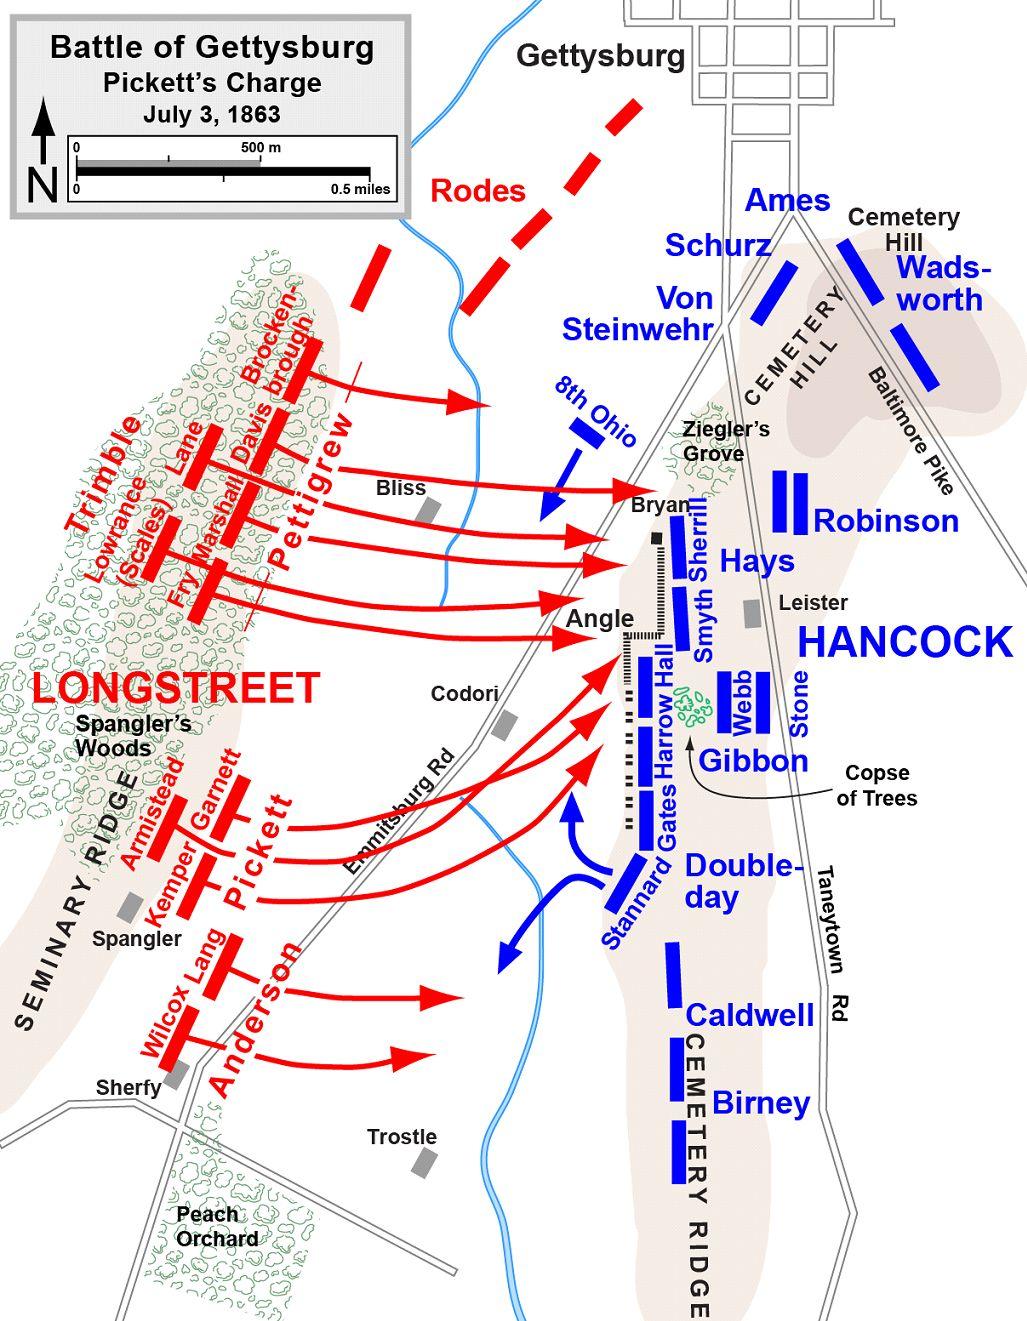 https://kotzkblog.files.wordpress.com/2015/07/gettysberg.jpg